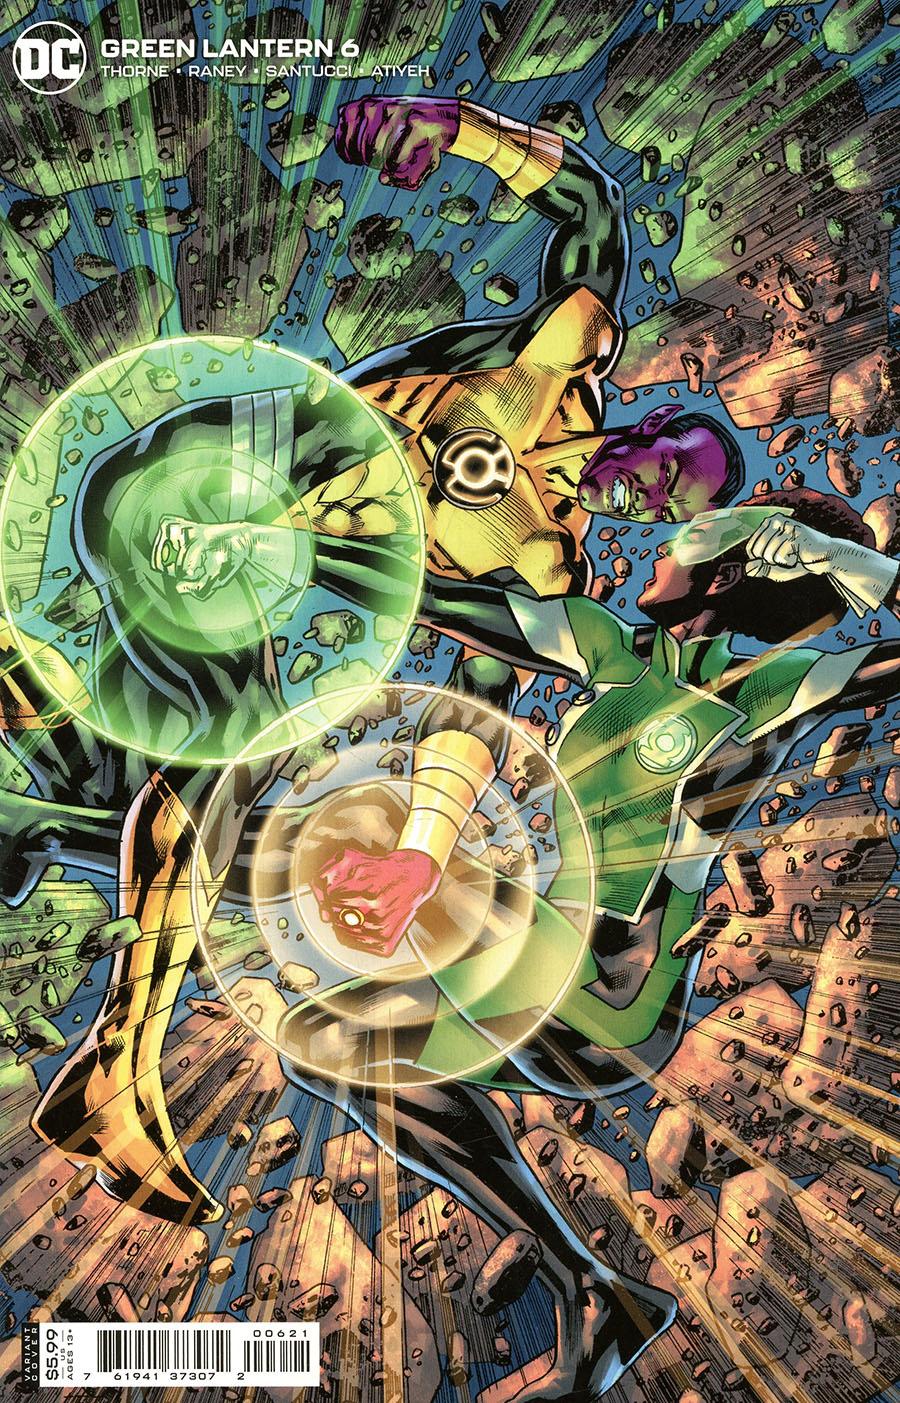 Green Lantern Vol 7 #6 Cover B Variant Bryan Hitch Card Stock Cover